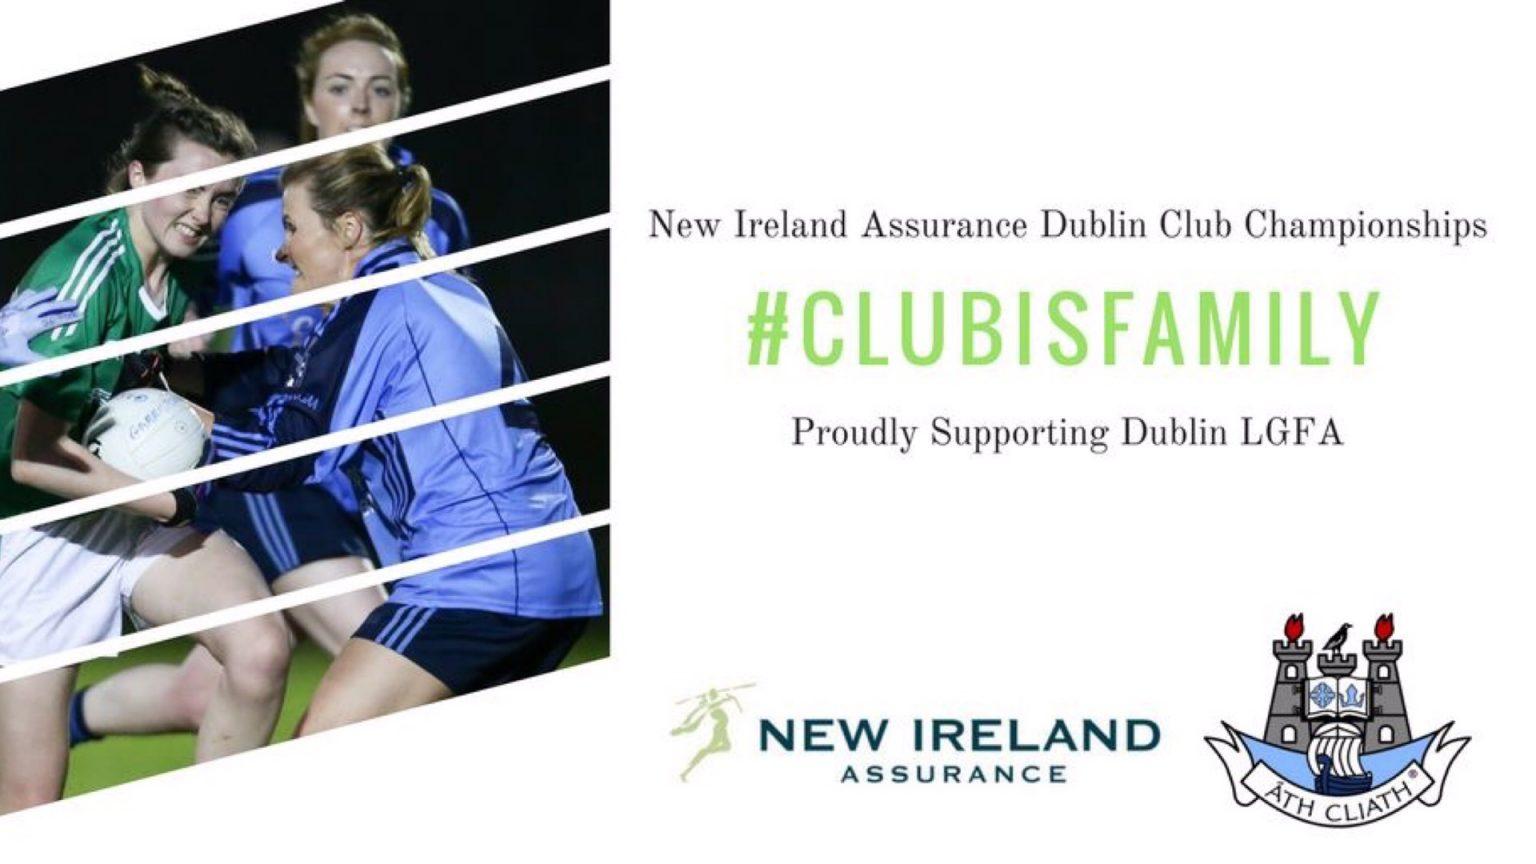 RESULTS FROM LAST NIGHT'S DUBLIN LGFA, NEW IRELAND ASSURANCE ADULT CLUB CHAMPIONSHIPS